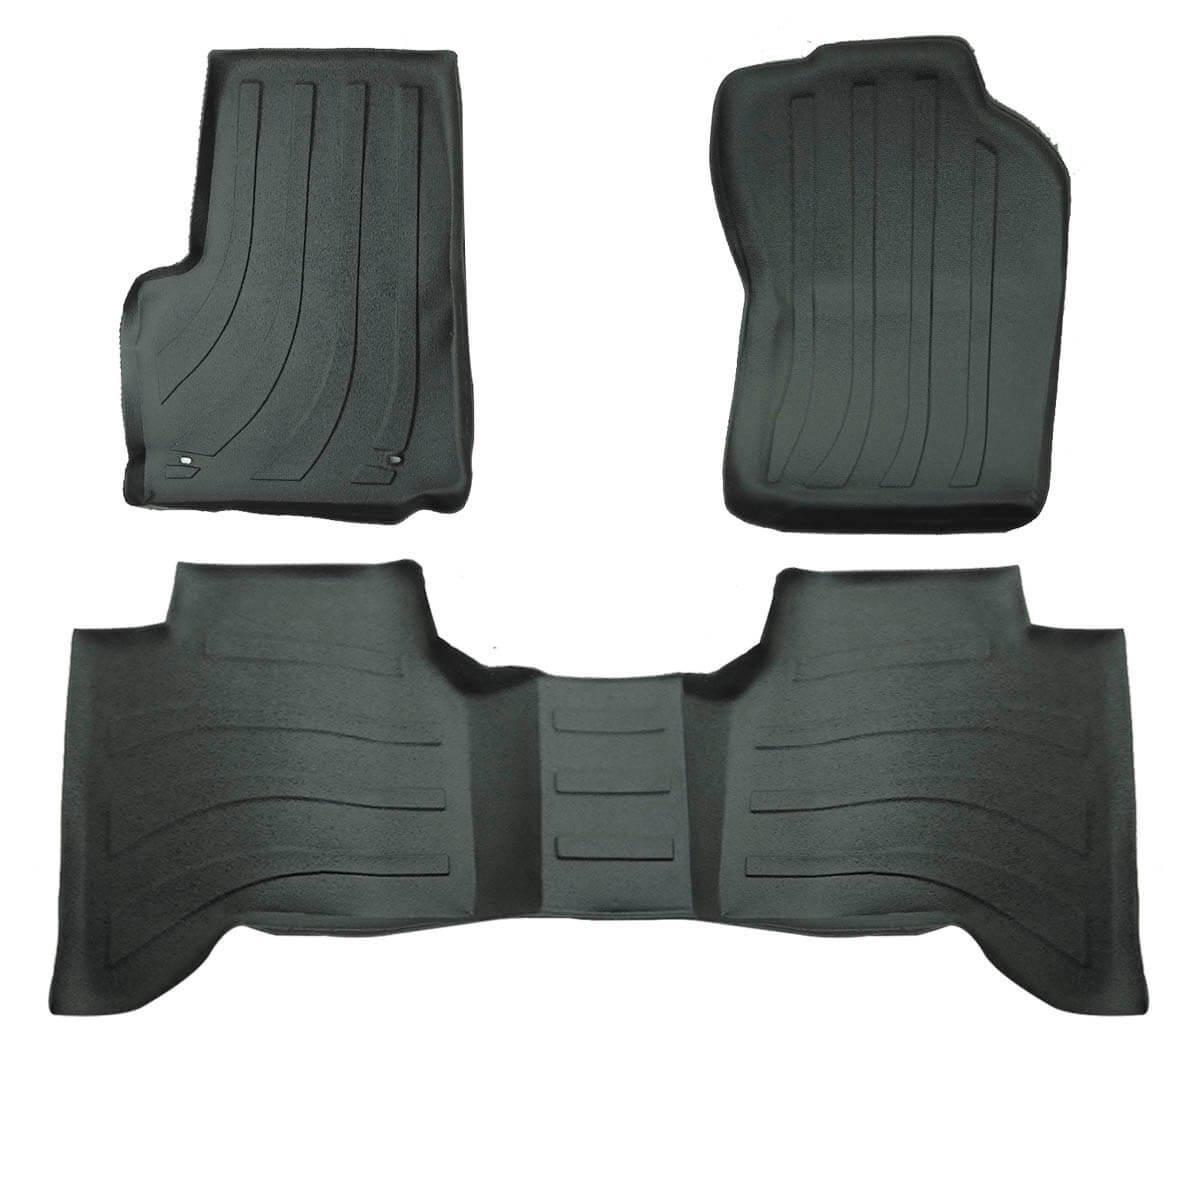 Tapete interno tipo bandeja 1,8 mm Nova S10 cabine dupla 2012 a 2020